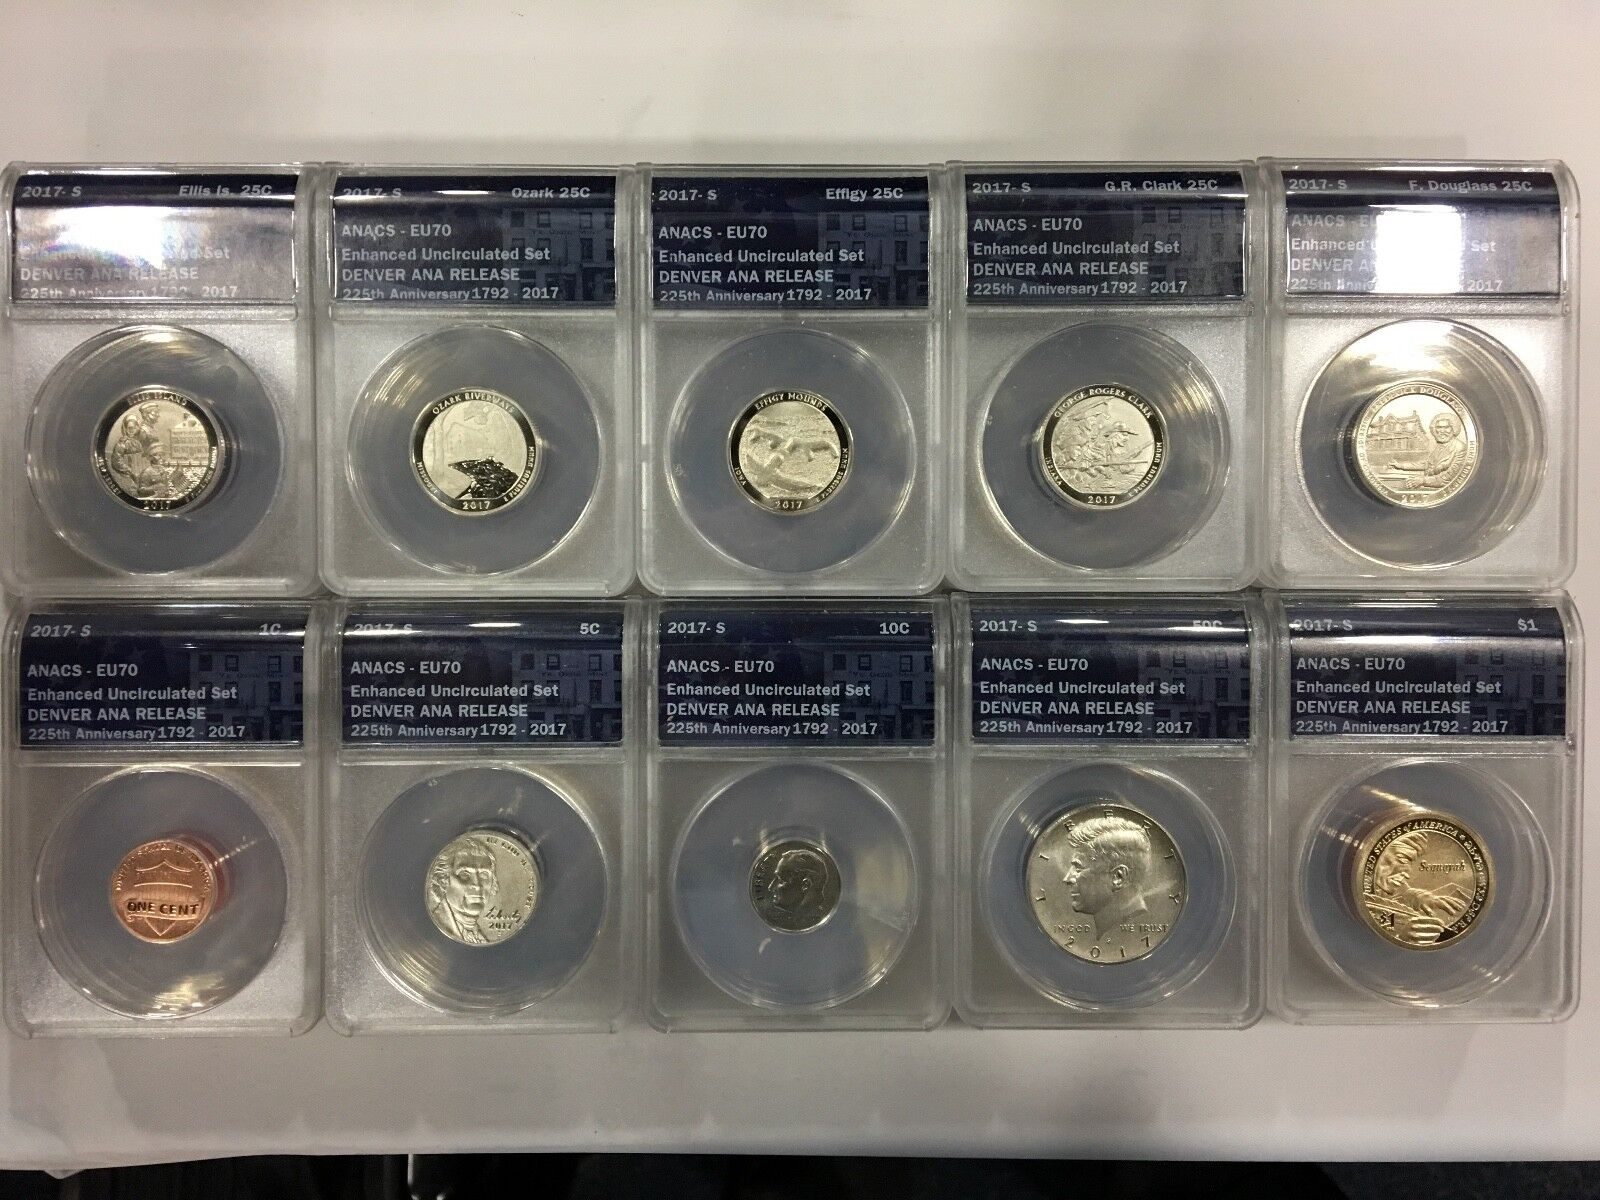 2017 S 225th Anniversary Enhanced Unc ANACS EU70 10 Coin Set Denver ANA Release